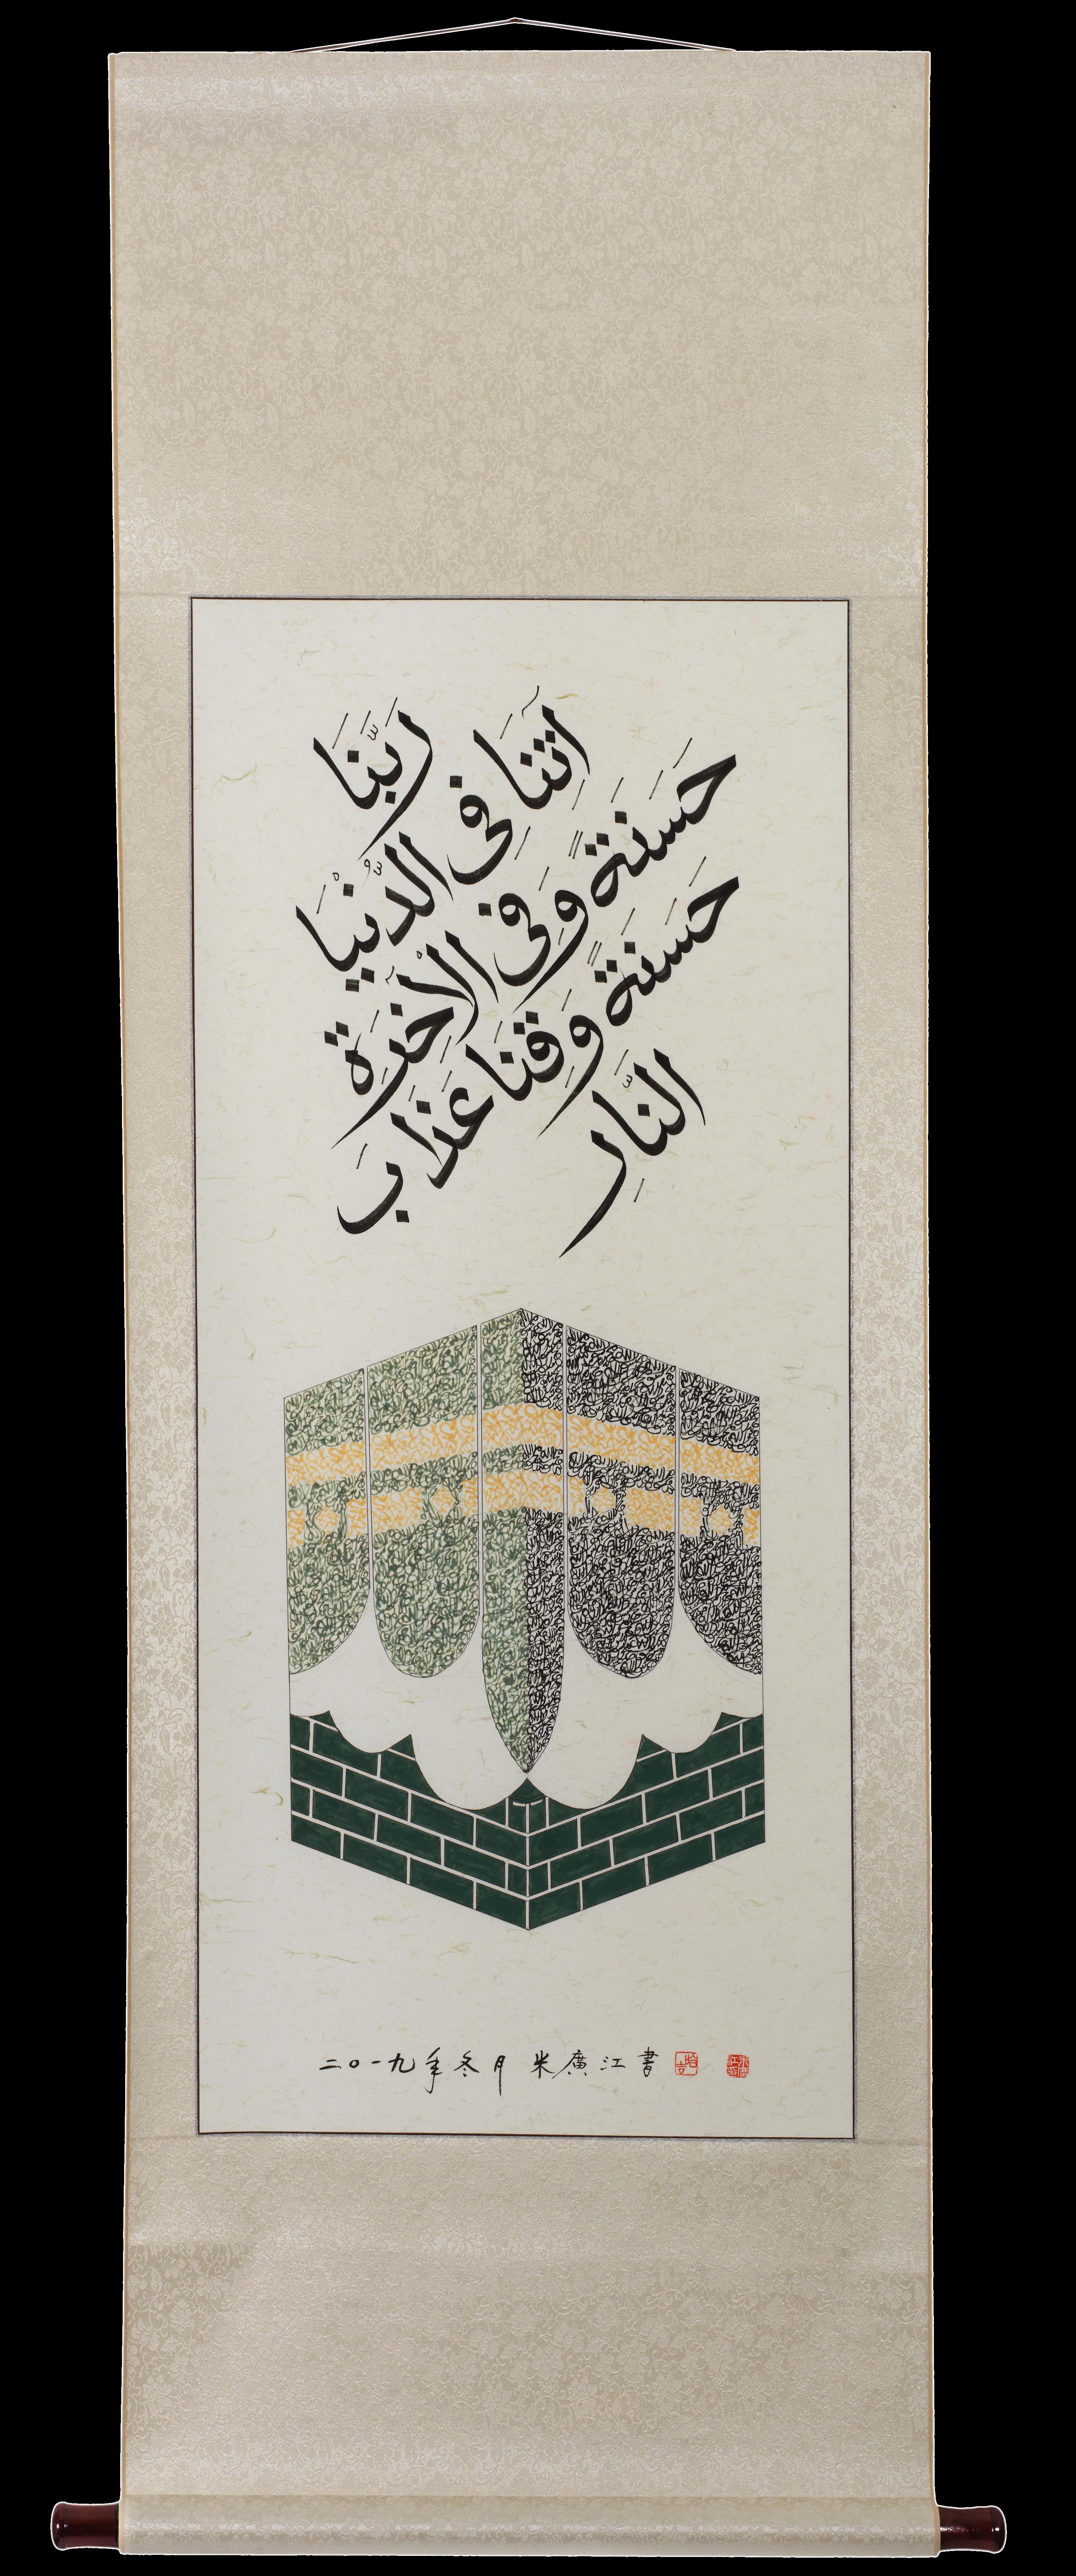 Chinese calligraphic Ka'bah scroll by Haji Noor Deen